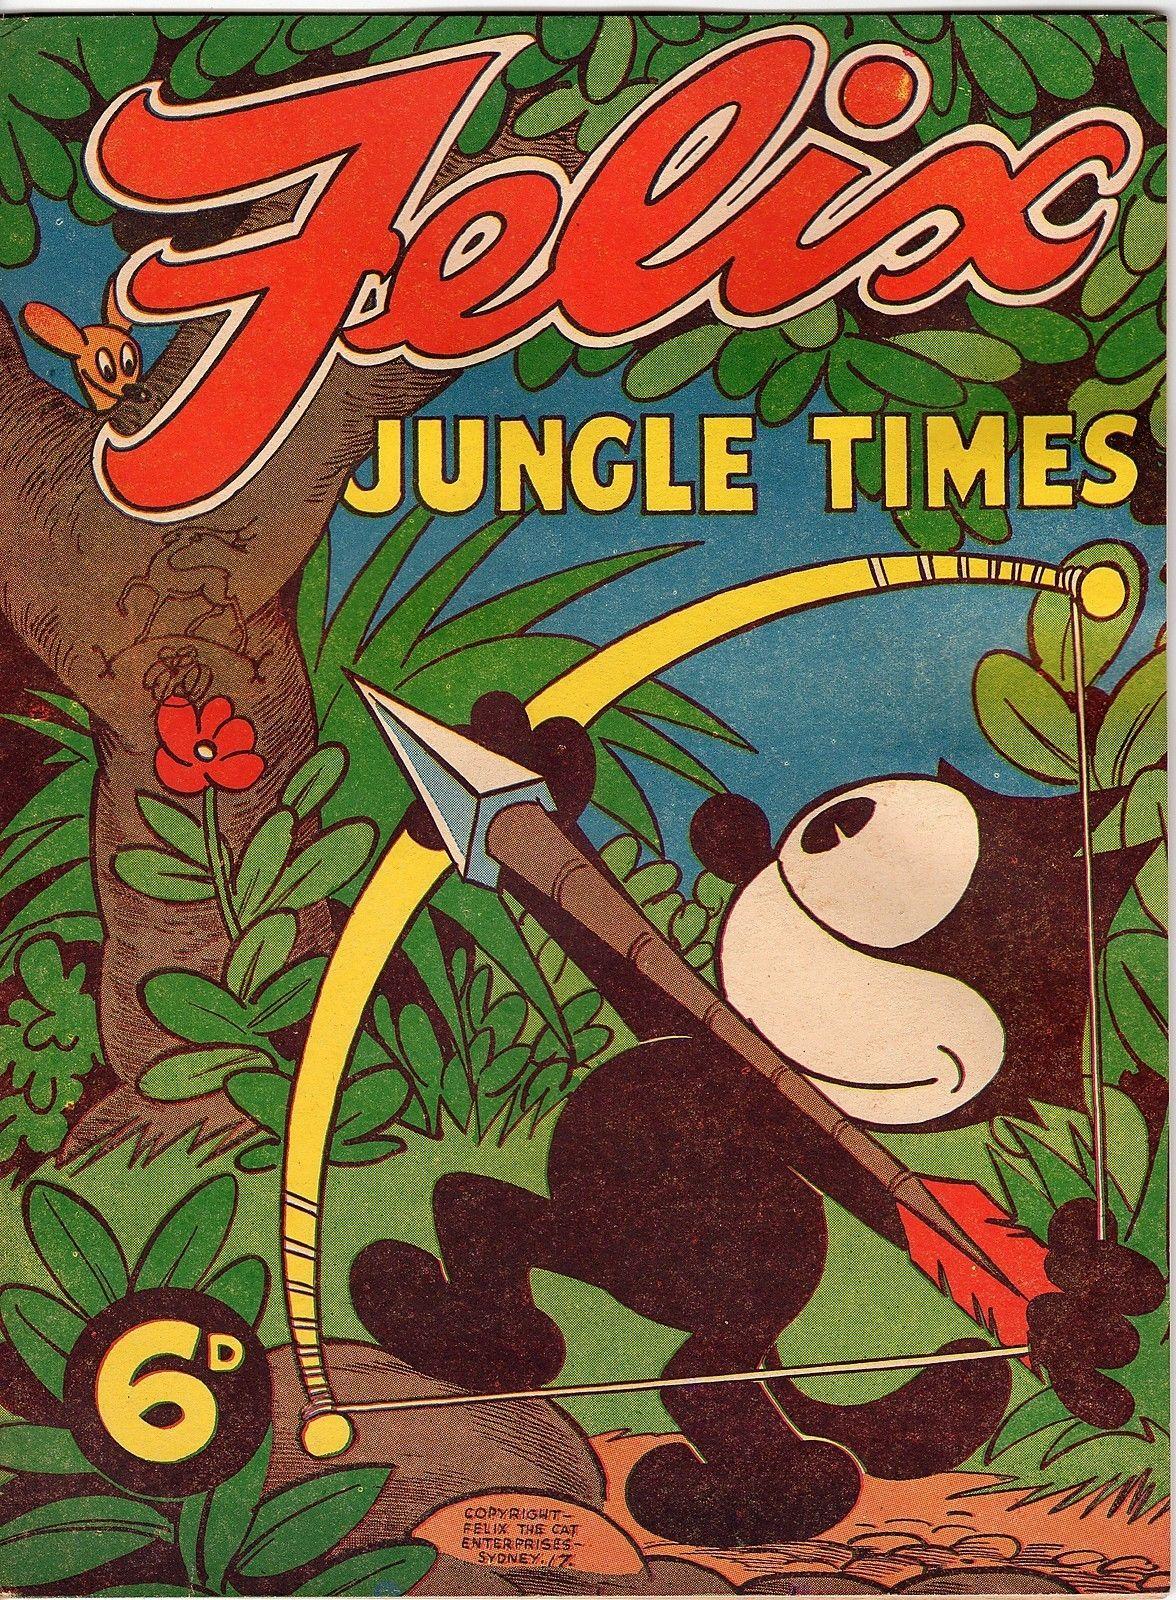 Felix 17 Jungle Times Golden Age Australian Ebay Felix The Cats Golden Age Comic Drawing